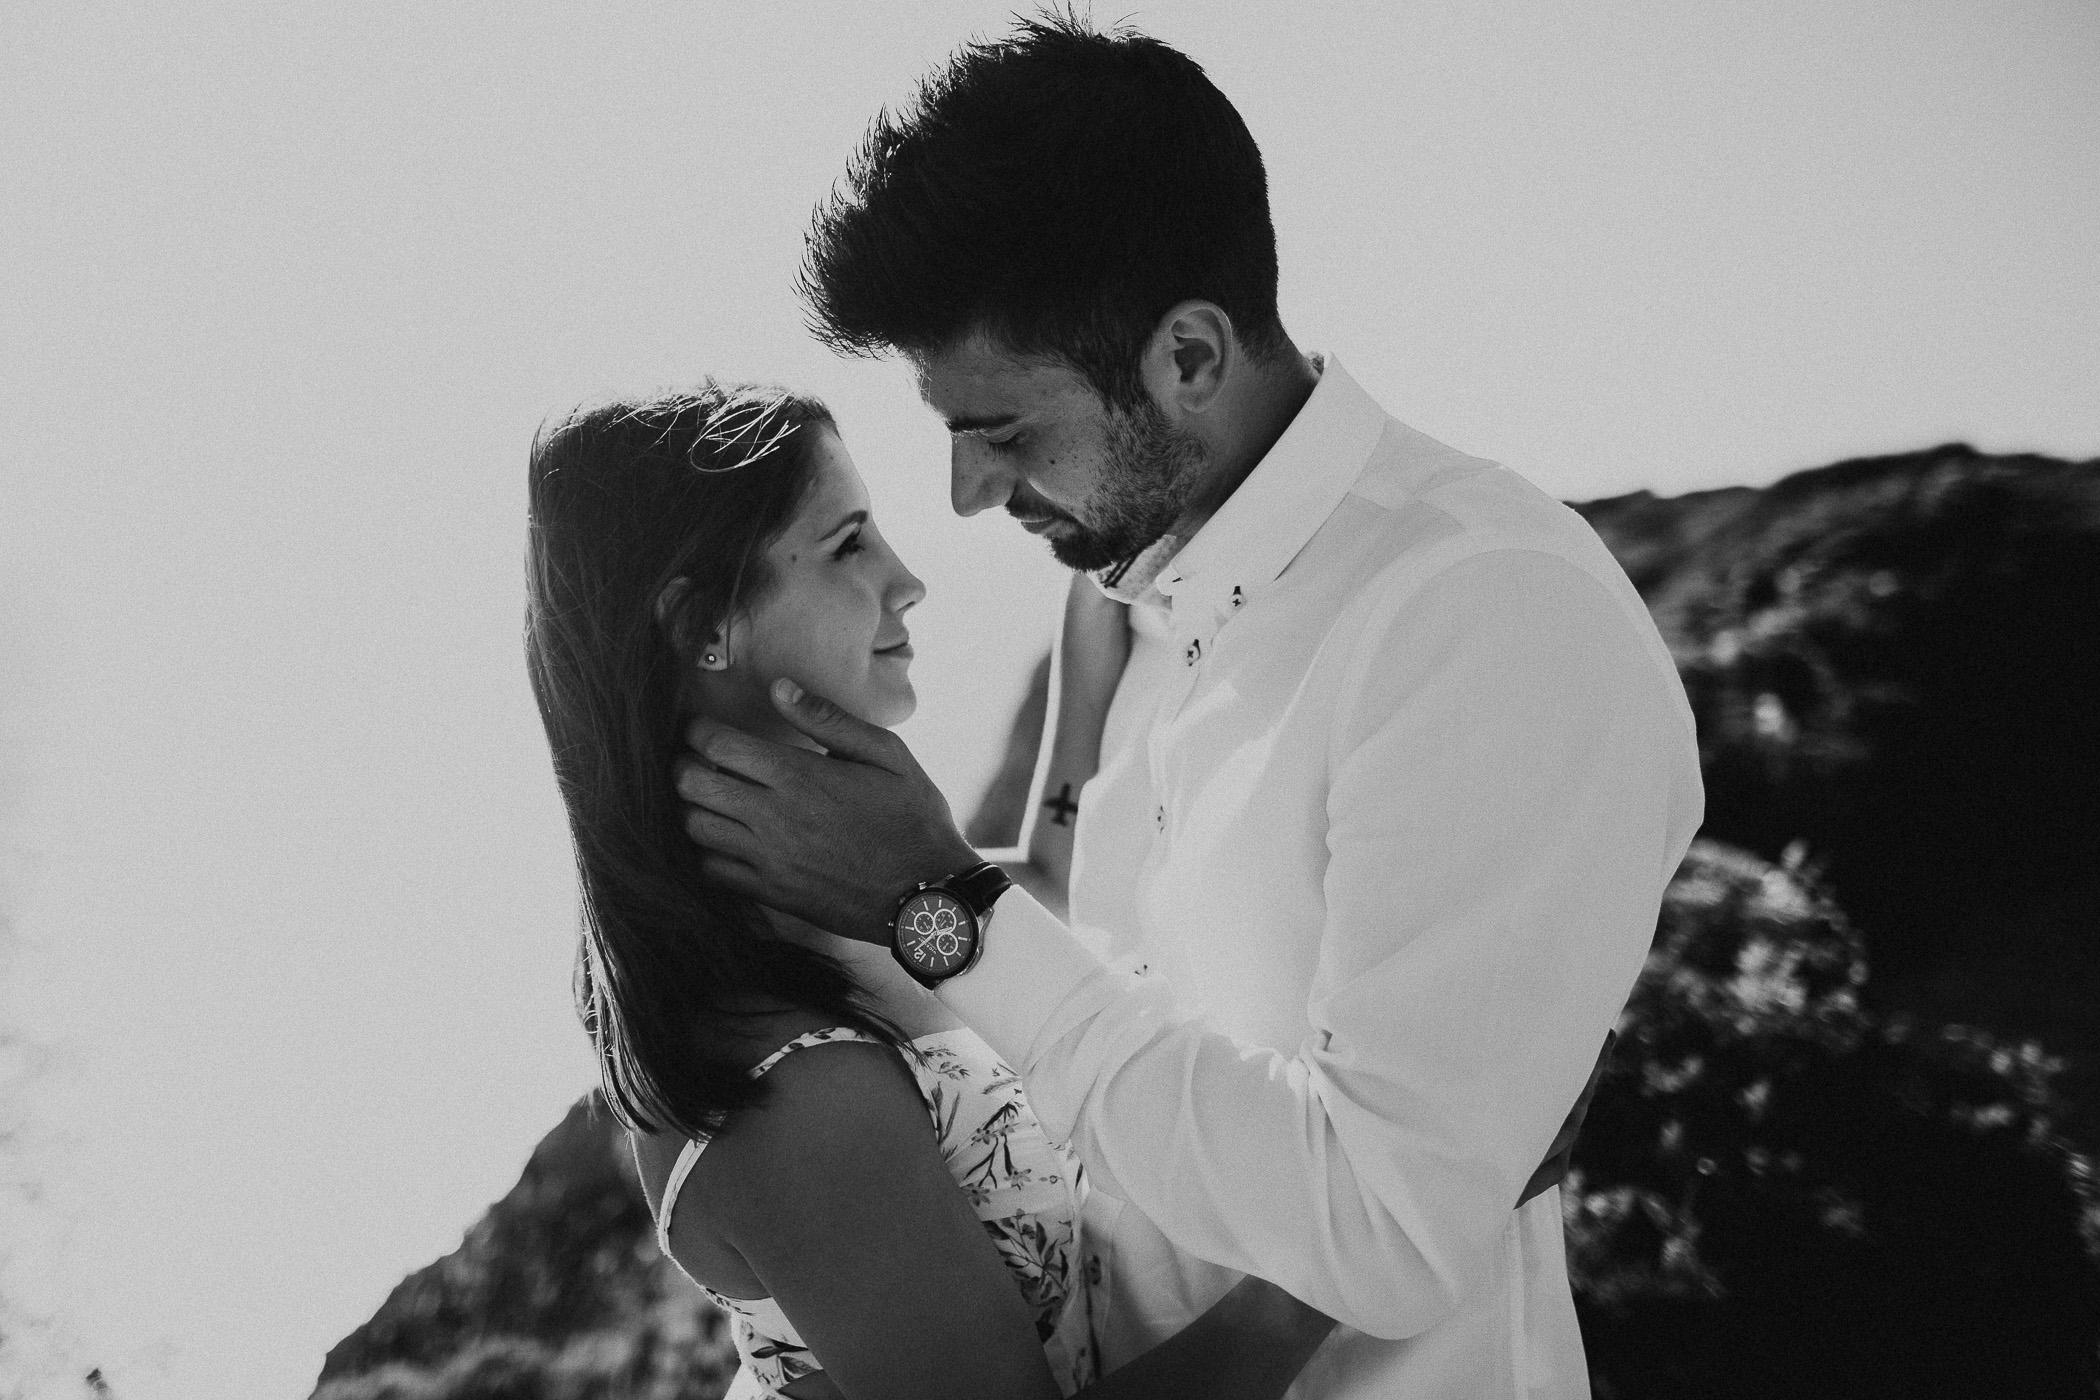 DanielaMarquardtPhotography_wedding_elopement_mallorca_spain_calapi_palma_lauraandtoni_200